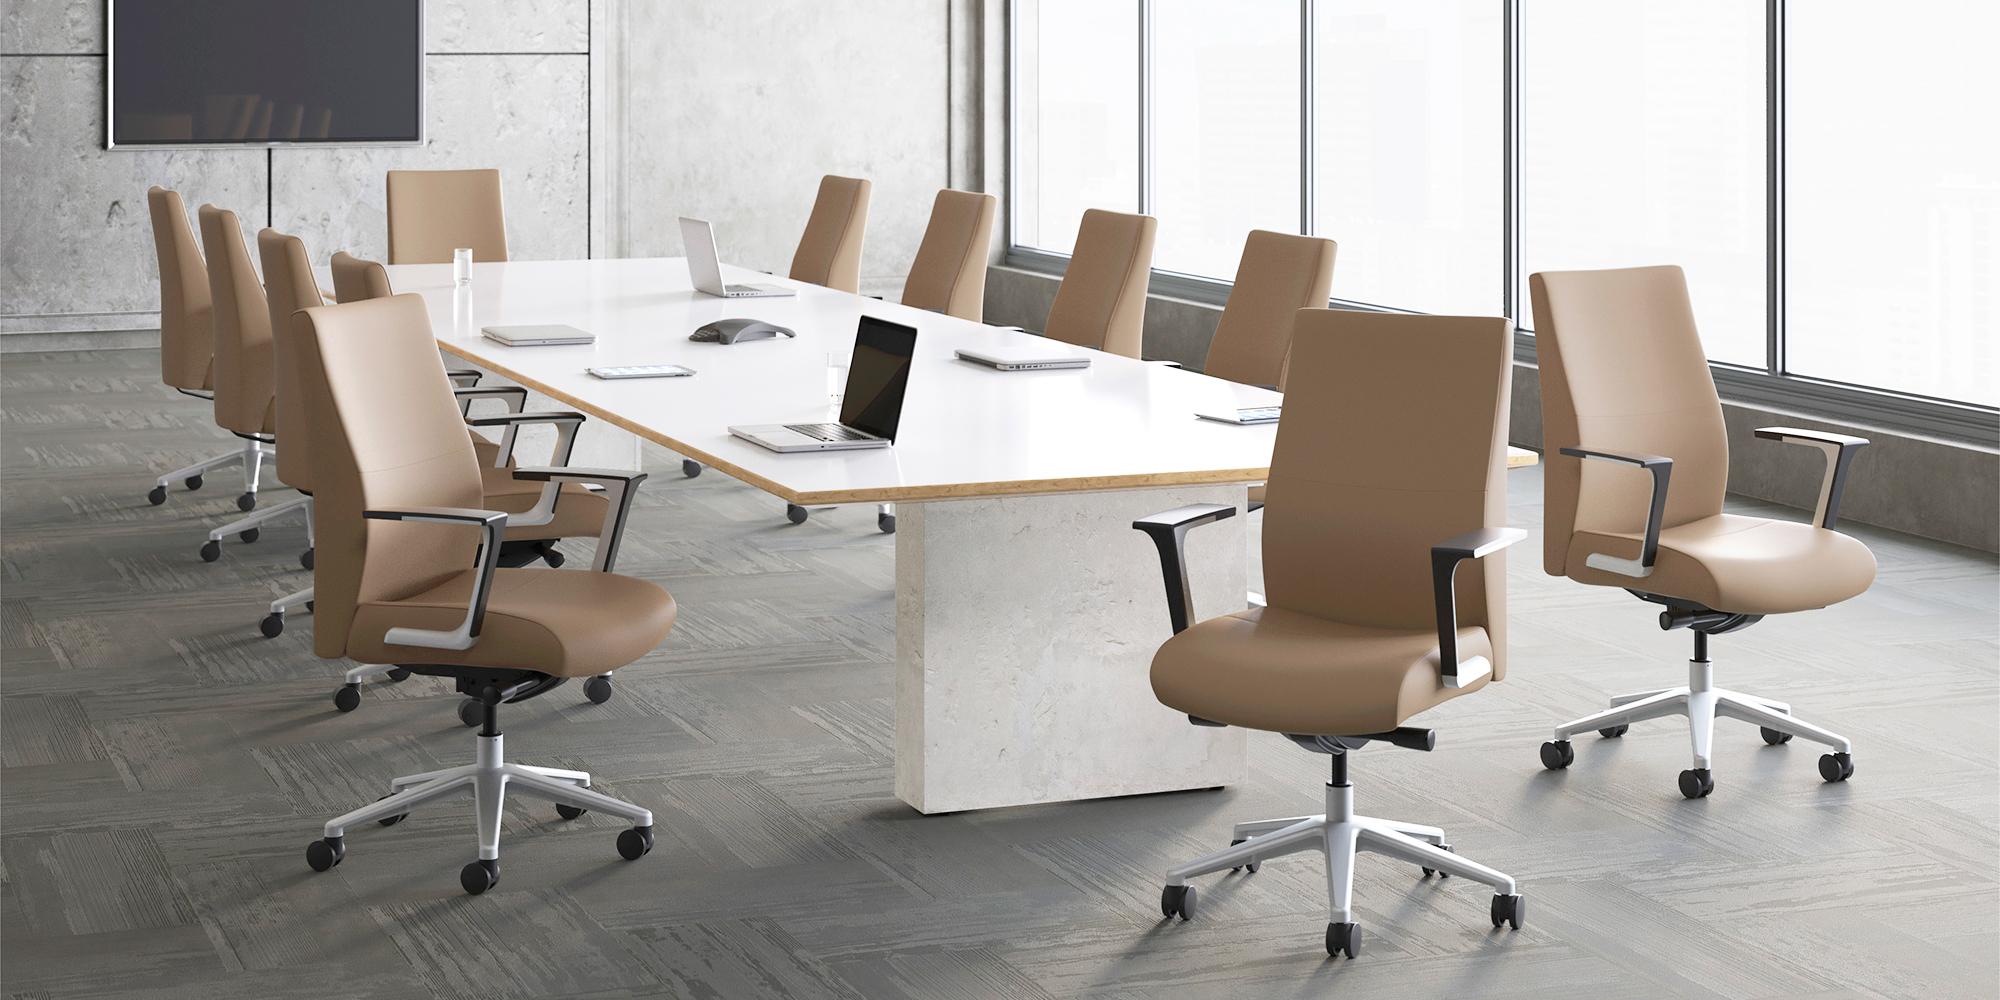 prava_conference_room_environment.jpg